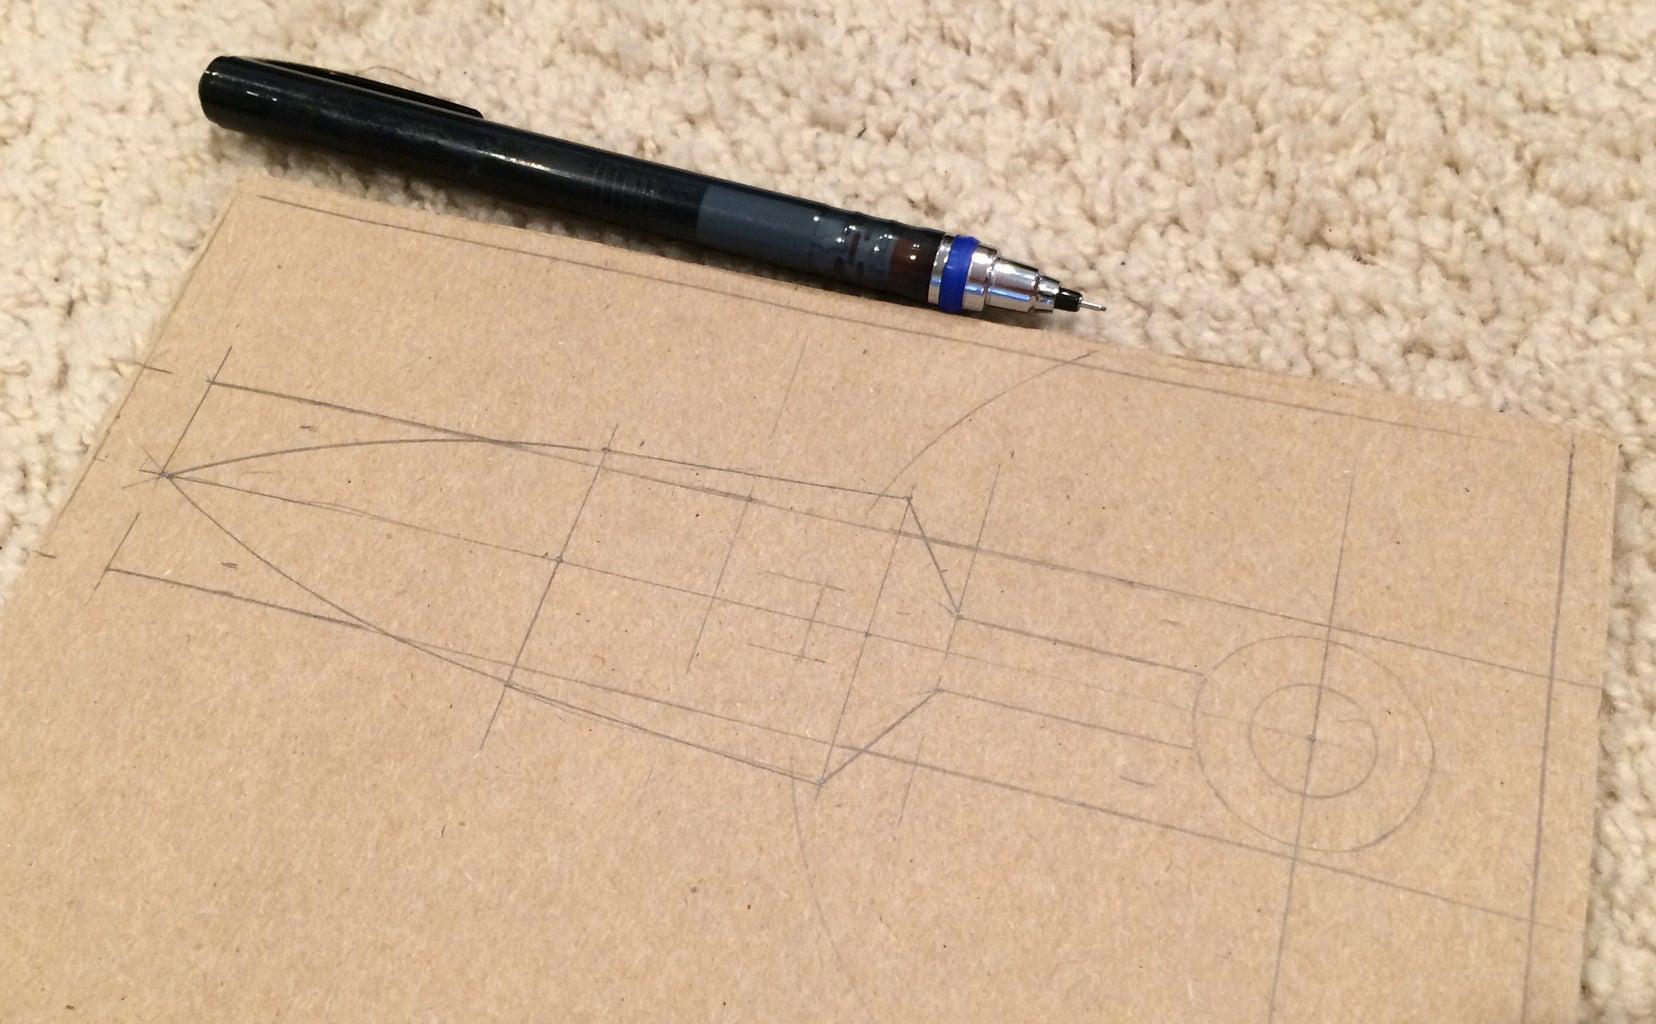 Shaping and Sketching